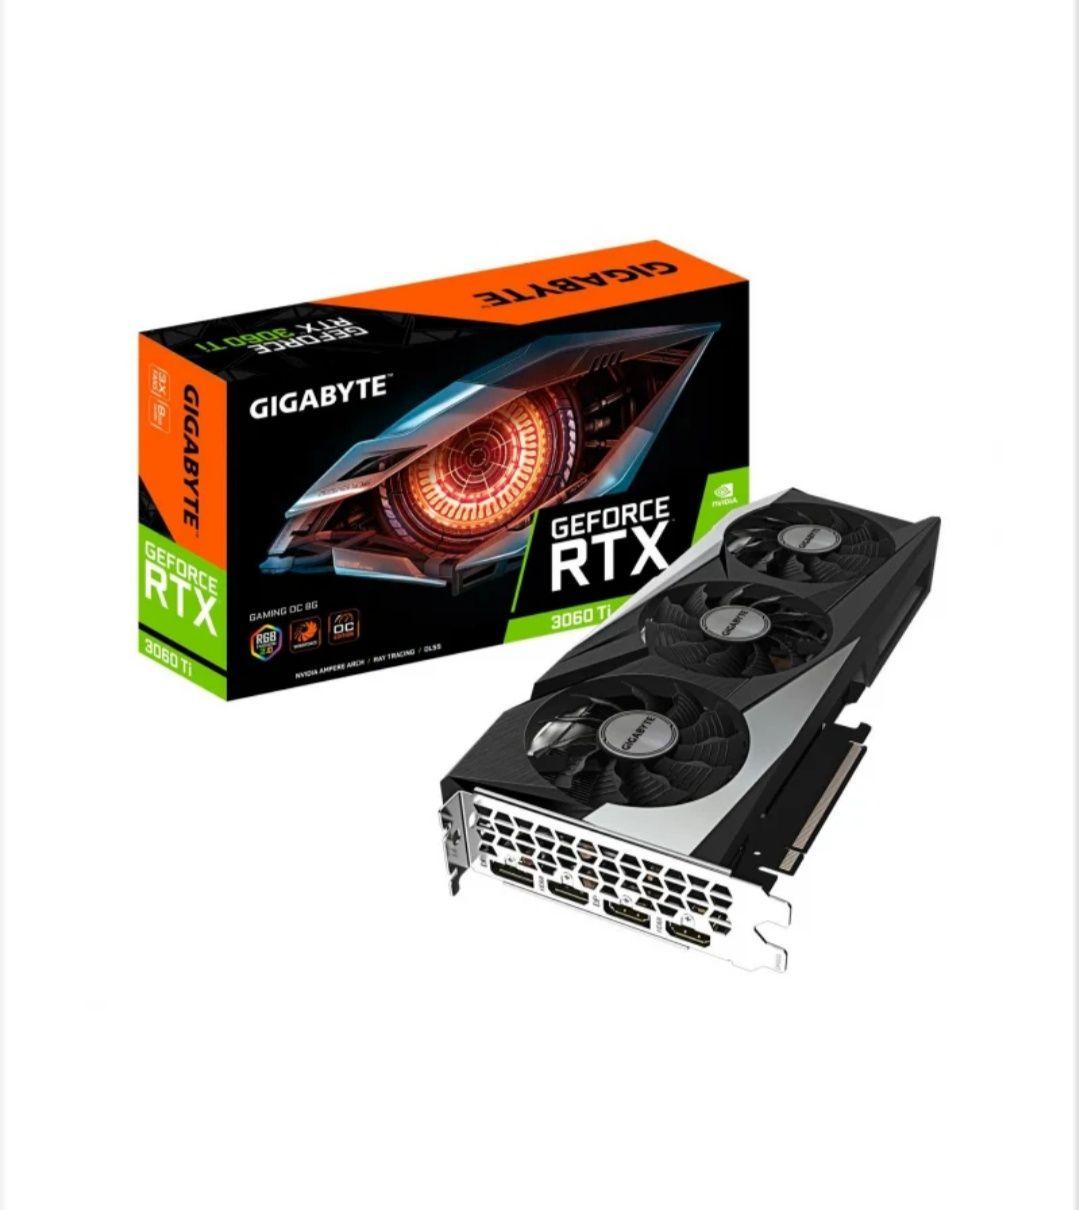 Karta Gigabyte GeForce RTX 3060 Ti Gaming OC 8GB GDDR6 Gwarancja!